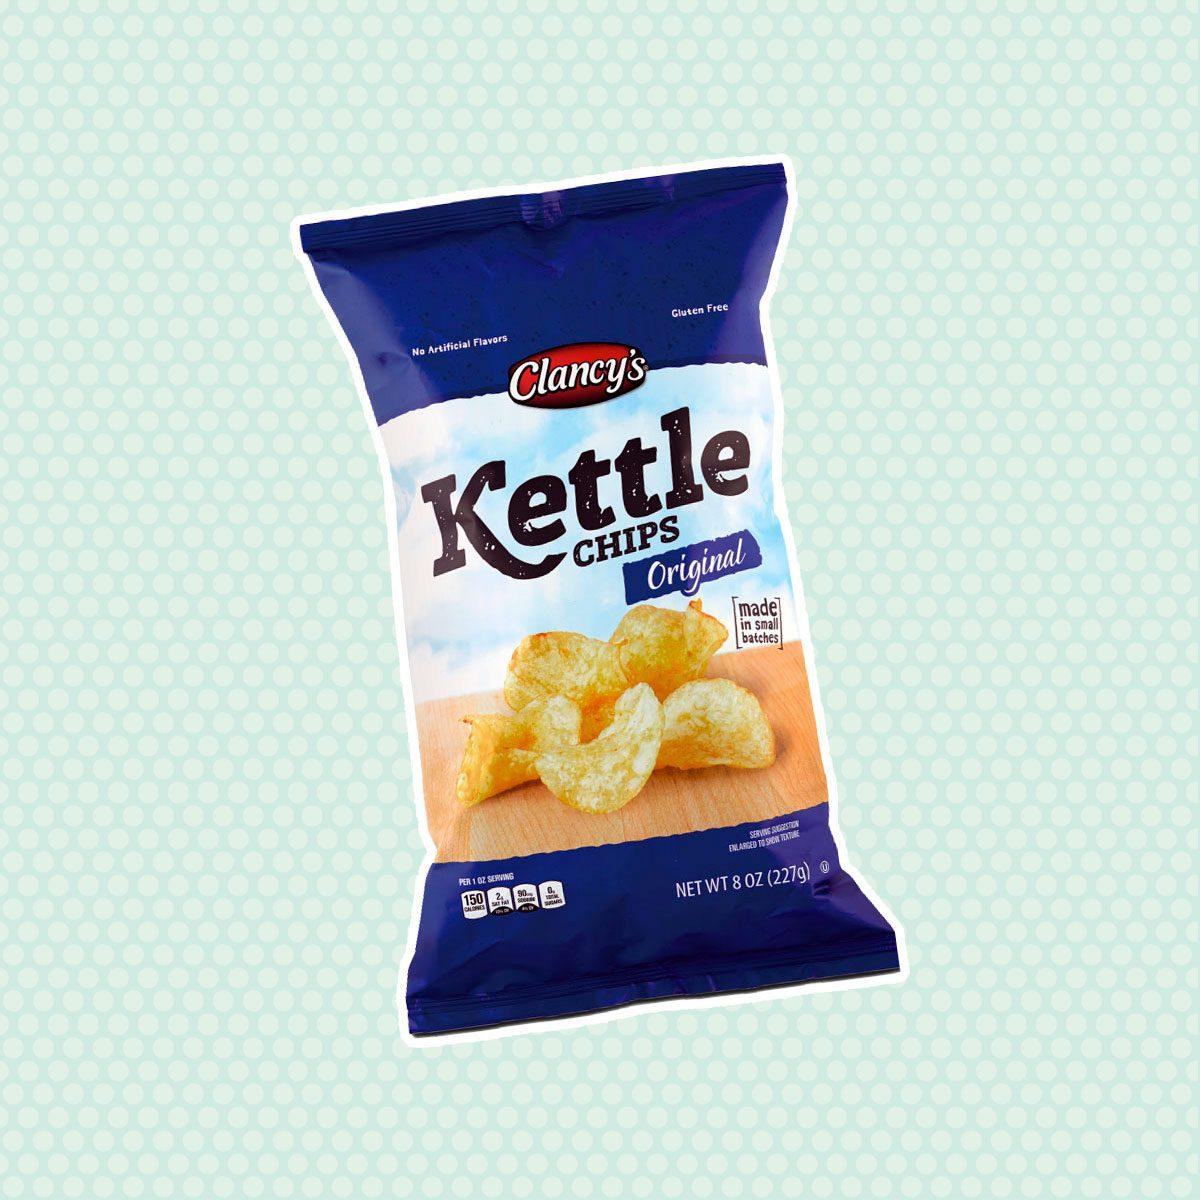 Clancys Kettle Chips Original